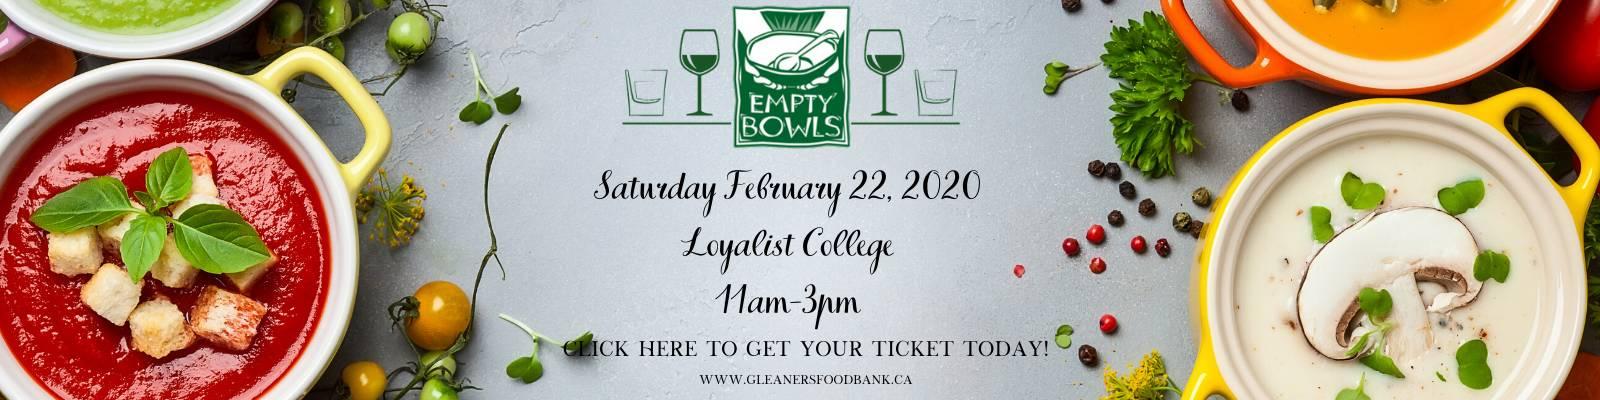 Empty Bowls Empty Glasses